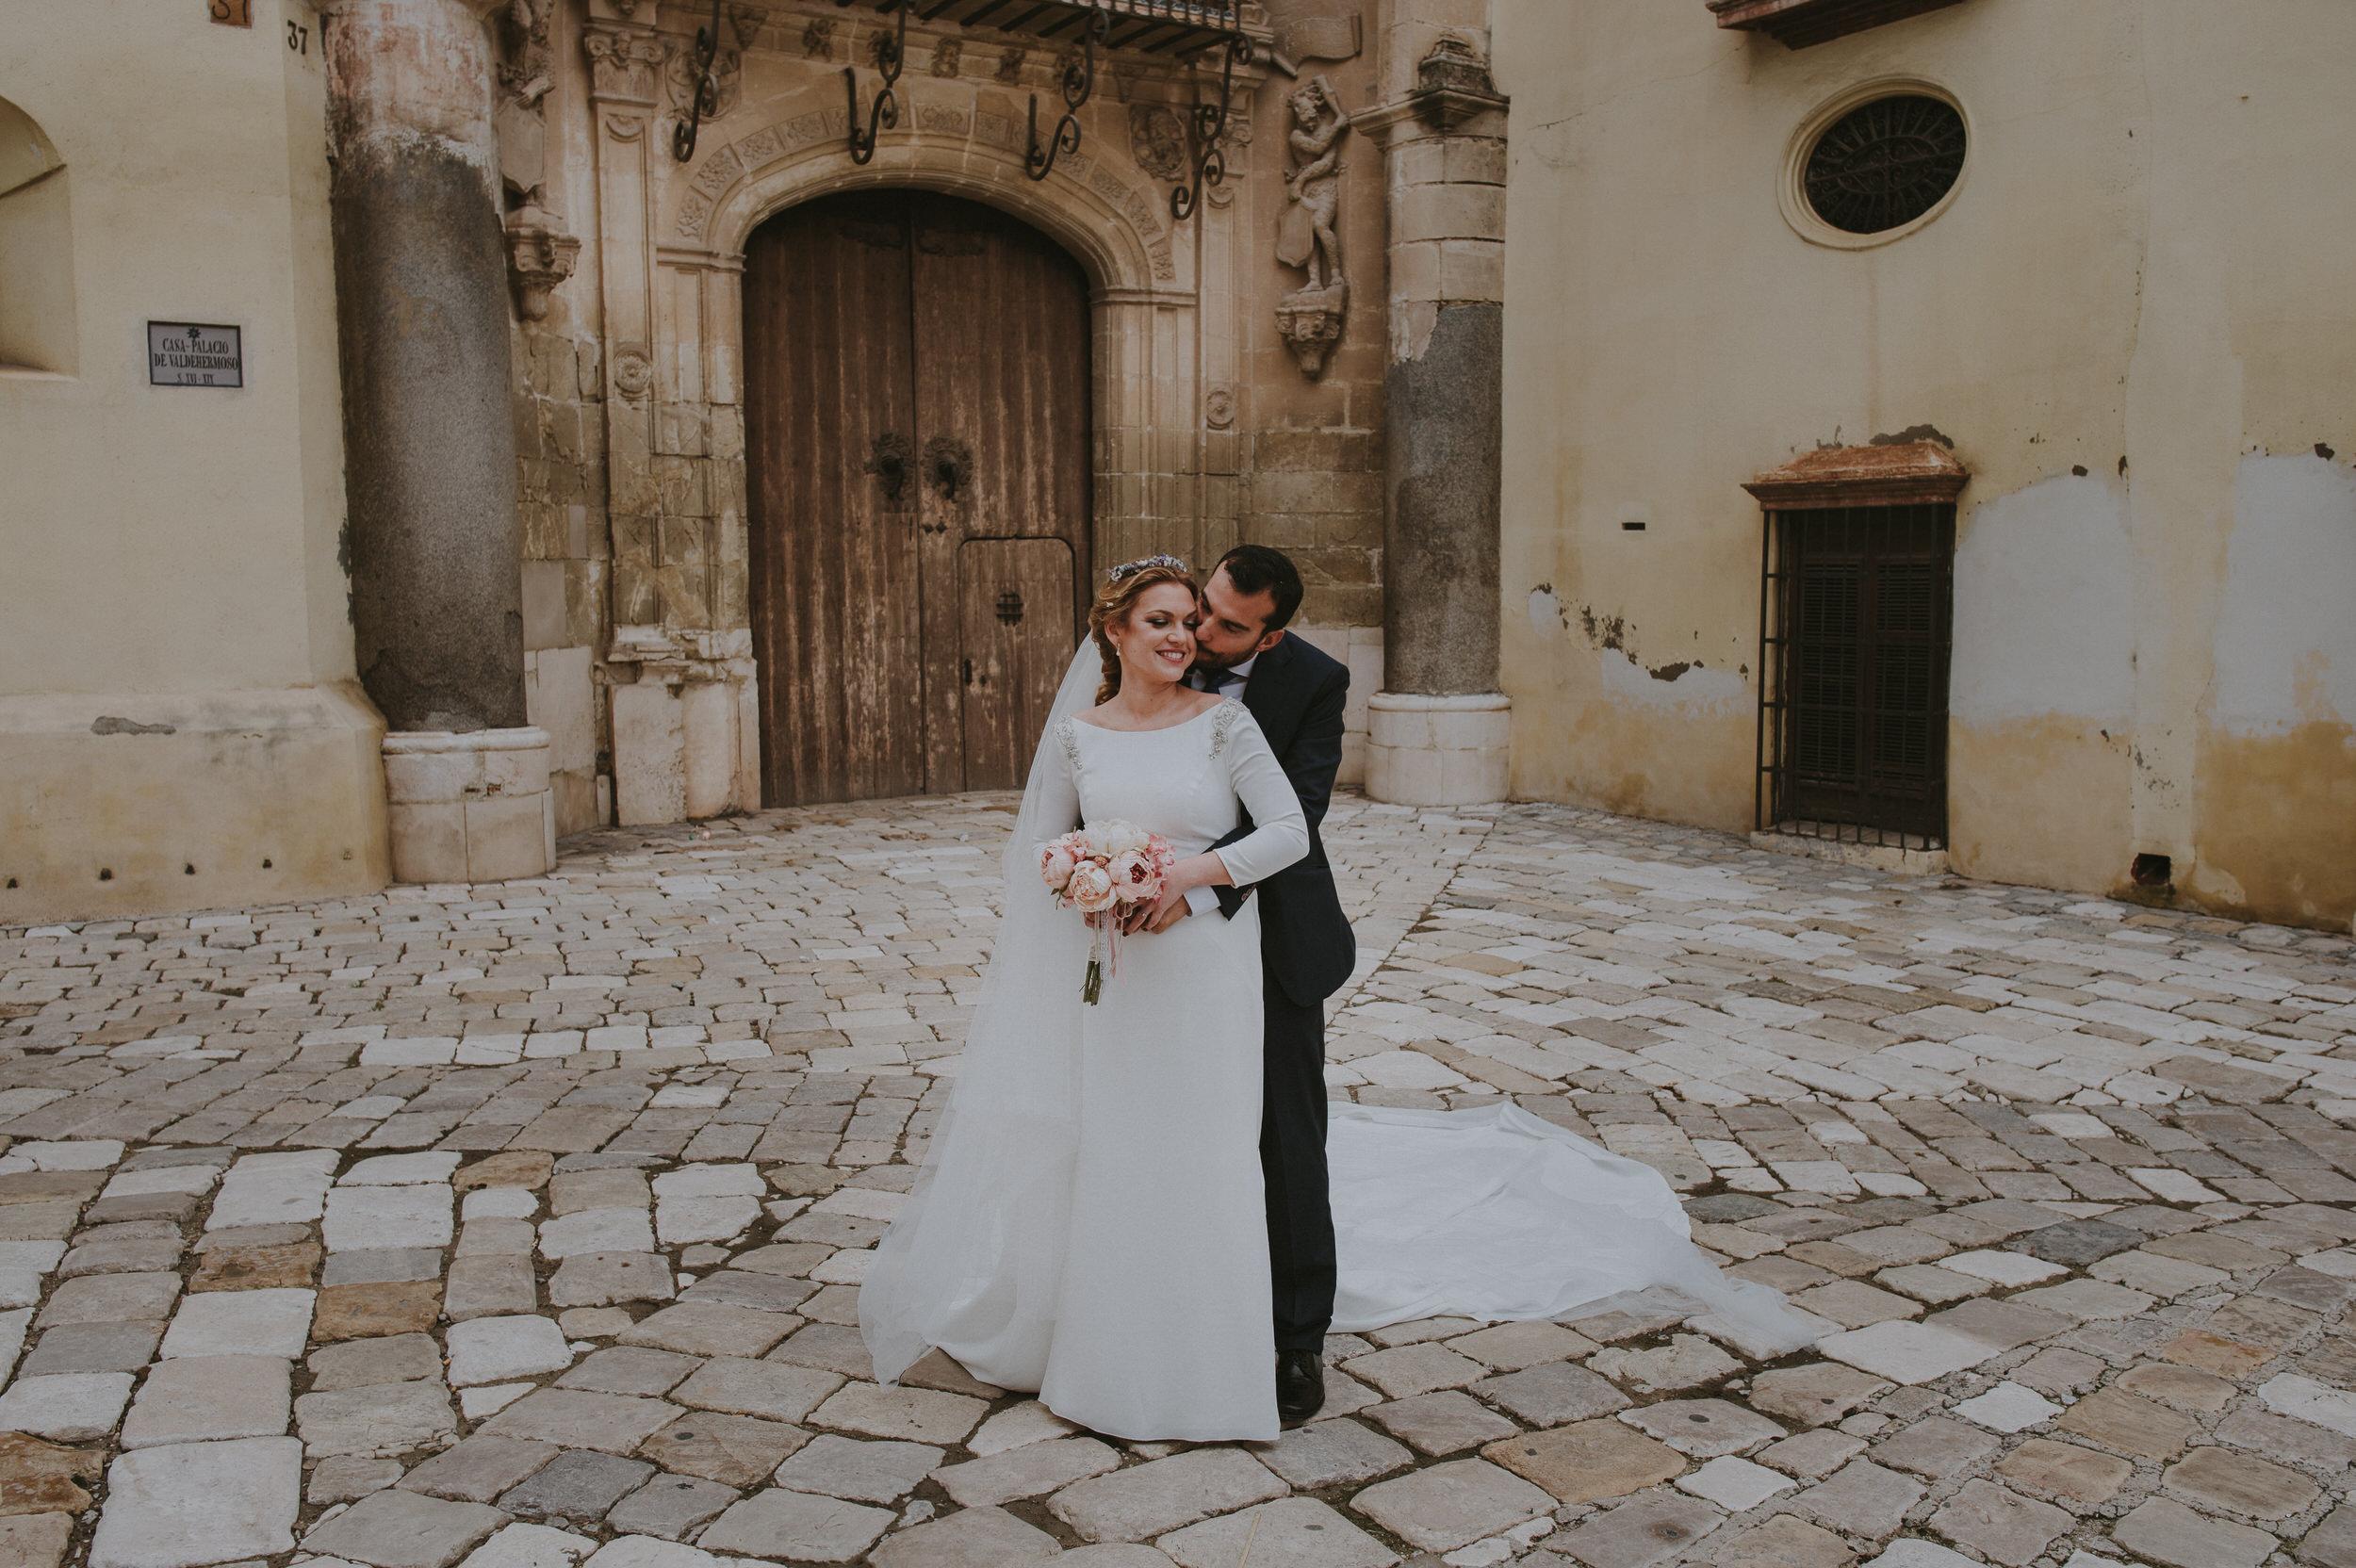 Cristina & Jero - Boda en Ecija - Iglesia Santa Ana - Fotógrafo Andrés Amarillo (37).JPG